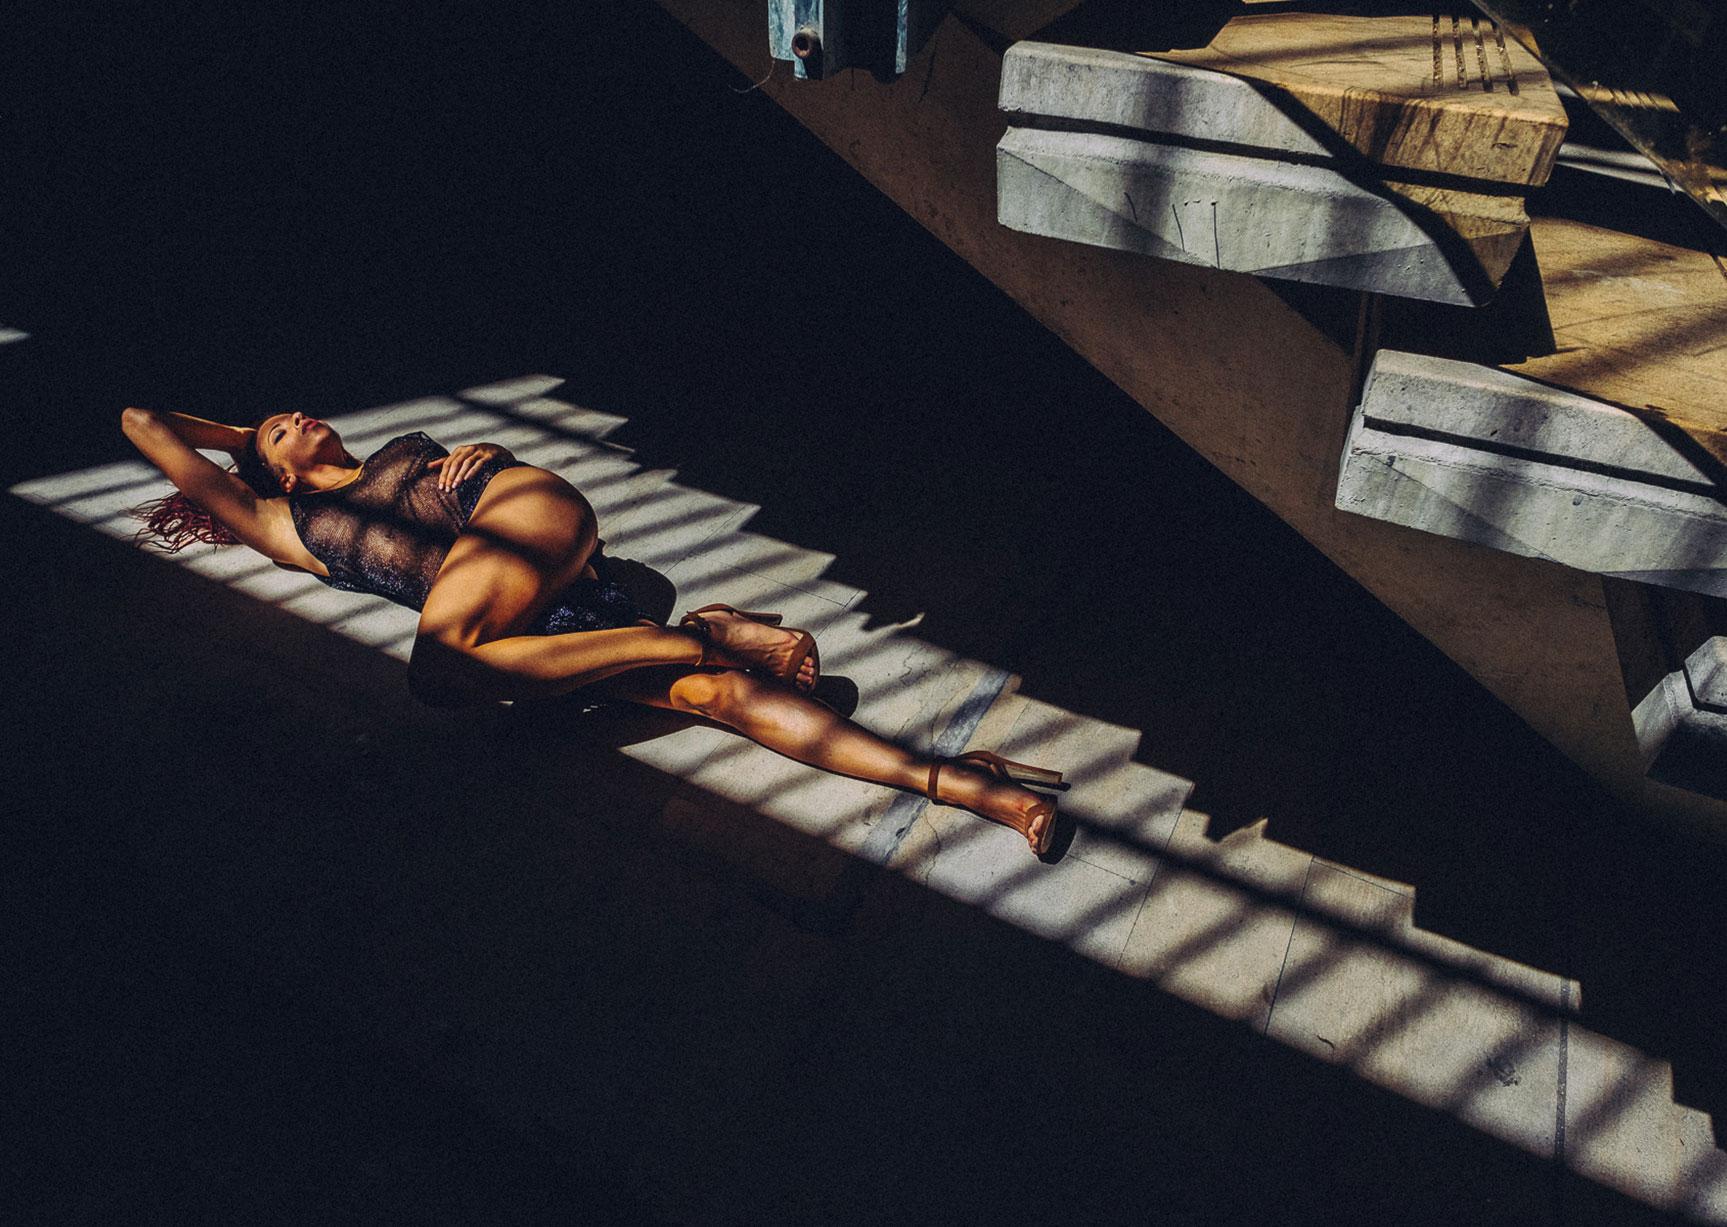 A floor under Heaven / Clara Rene by Yan Senez